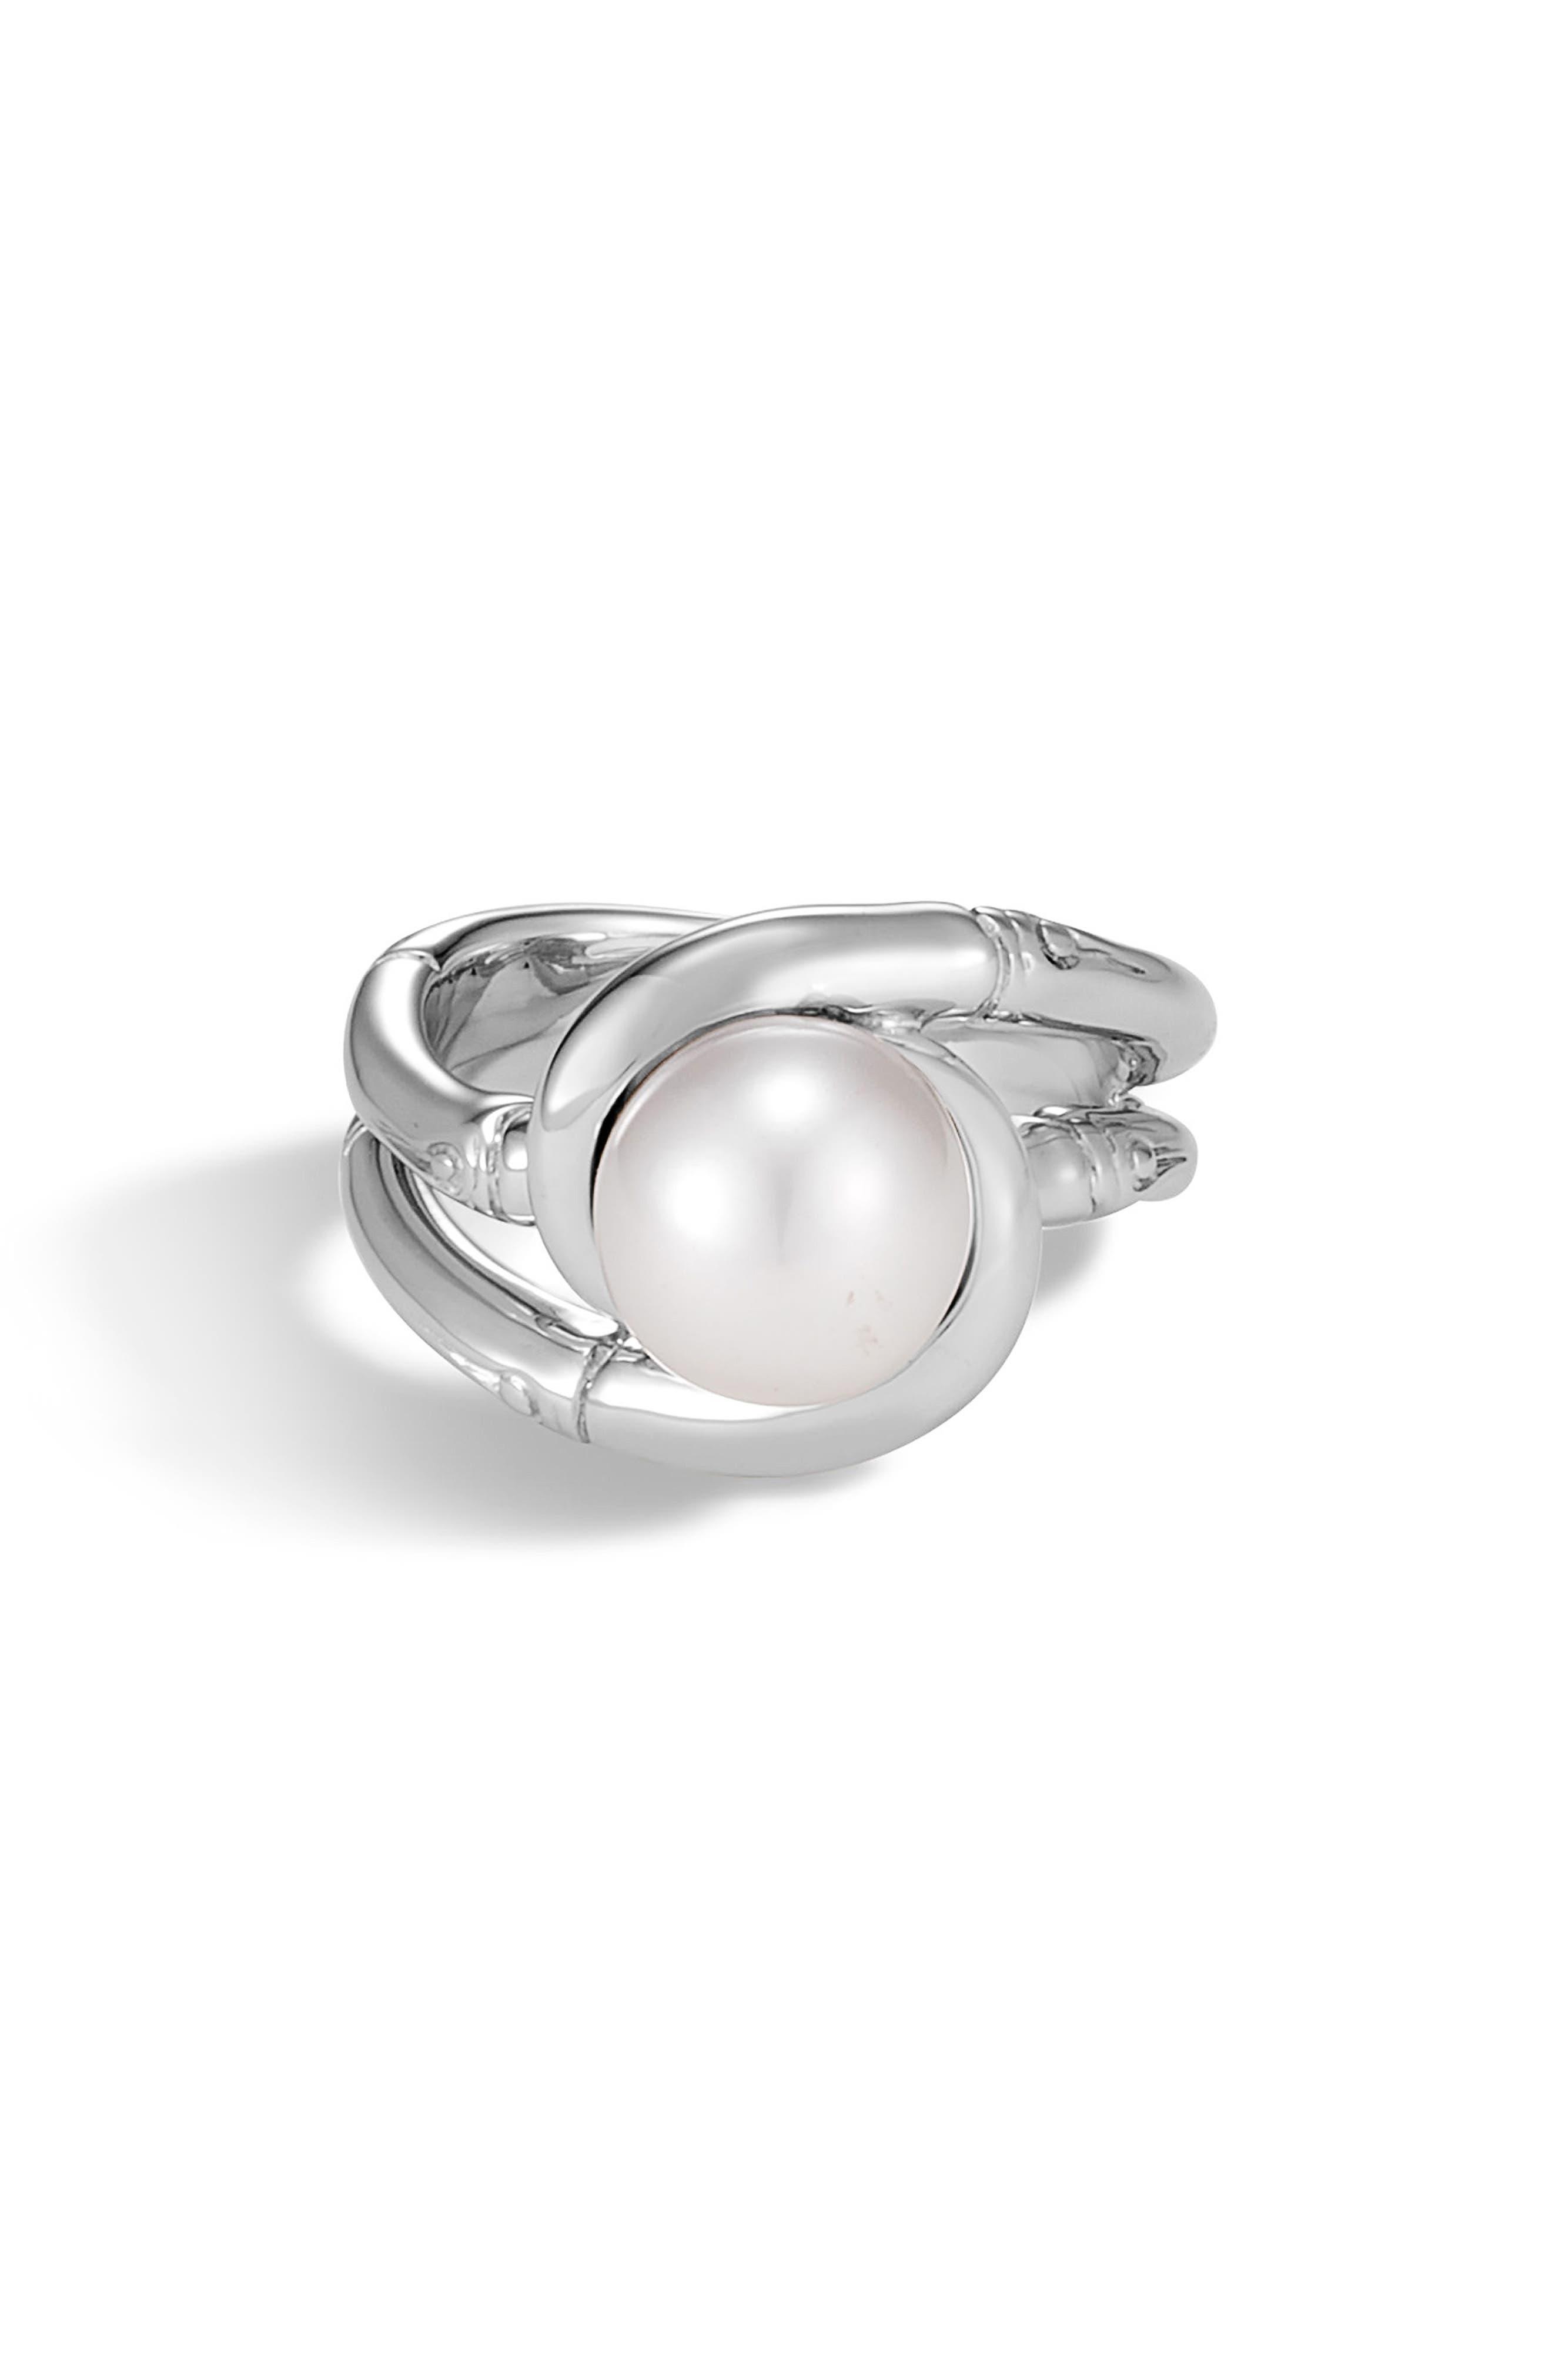 Bamboo Pearl Ring,                         Main,                         color, SILVER/ PEARL